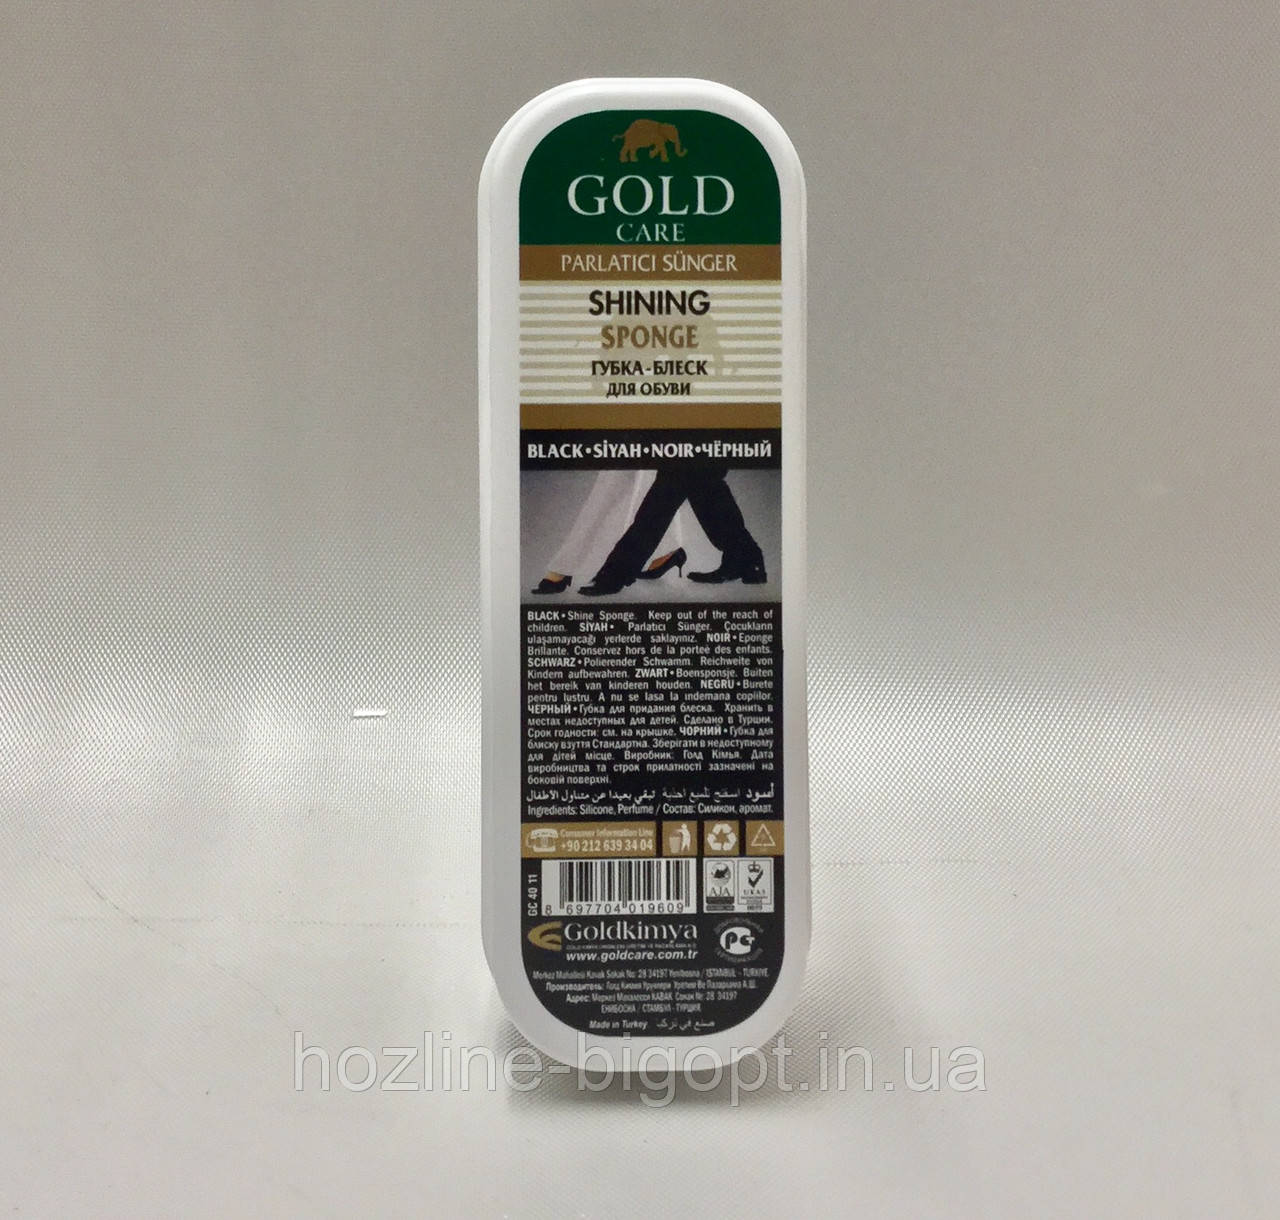 Gold Care Губка для обуви Стандарт ЧЕРНАЯ